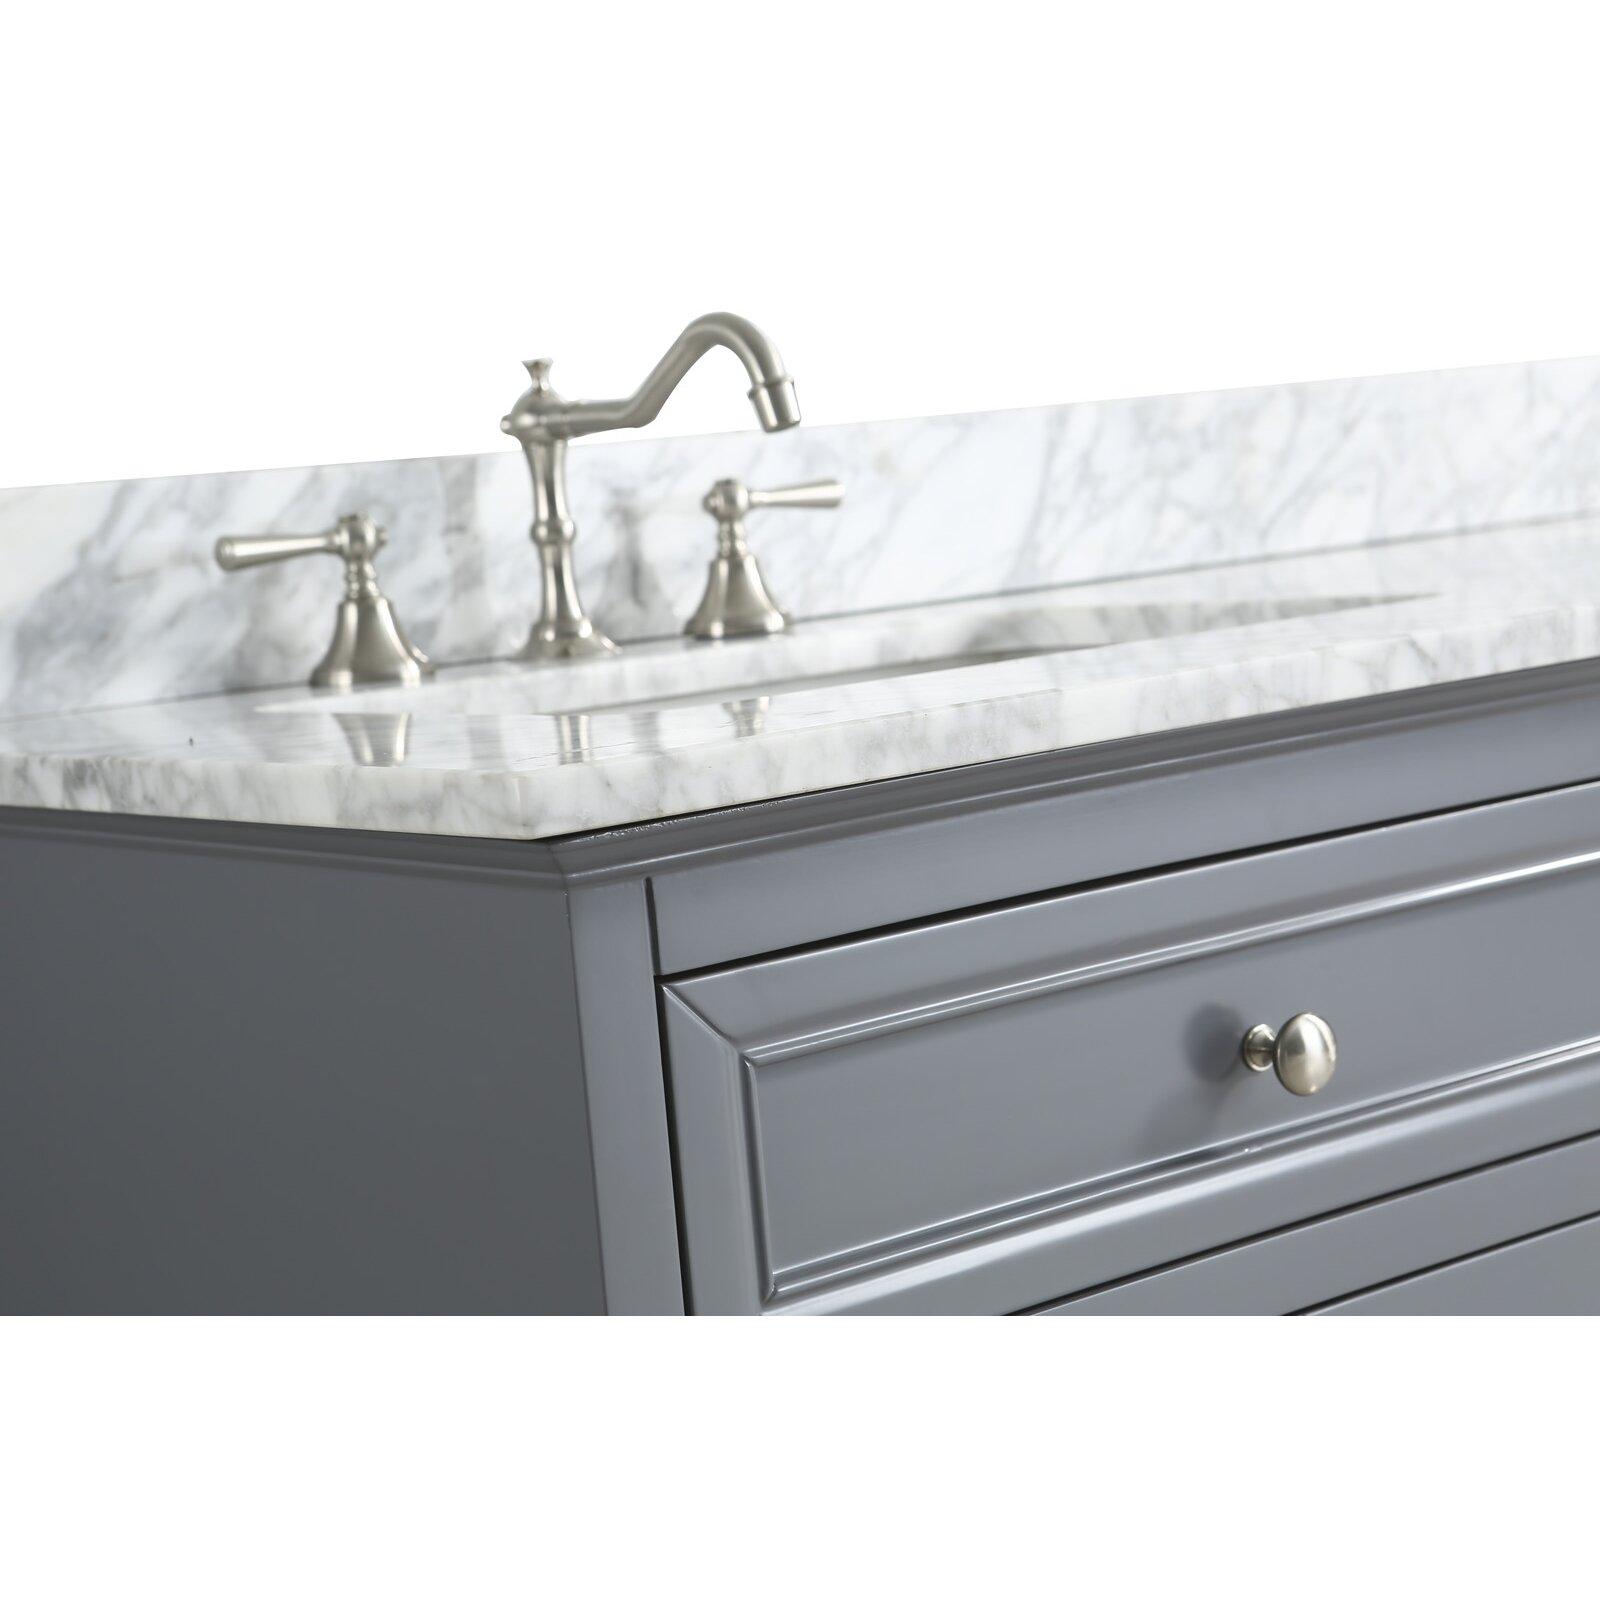 "Double Sink Mirrored Bathroom Vanity: Urban Furnishings Rochelle 60"" Double Bathroom Sink Vanity"